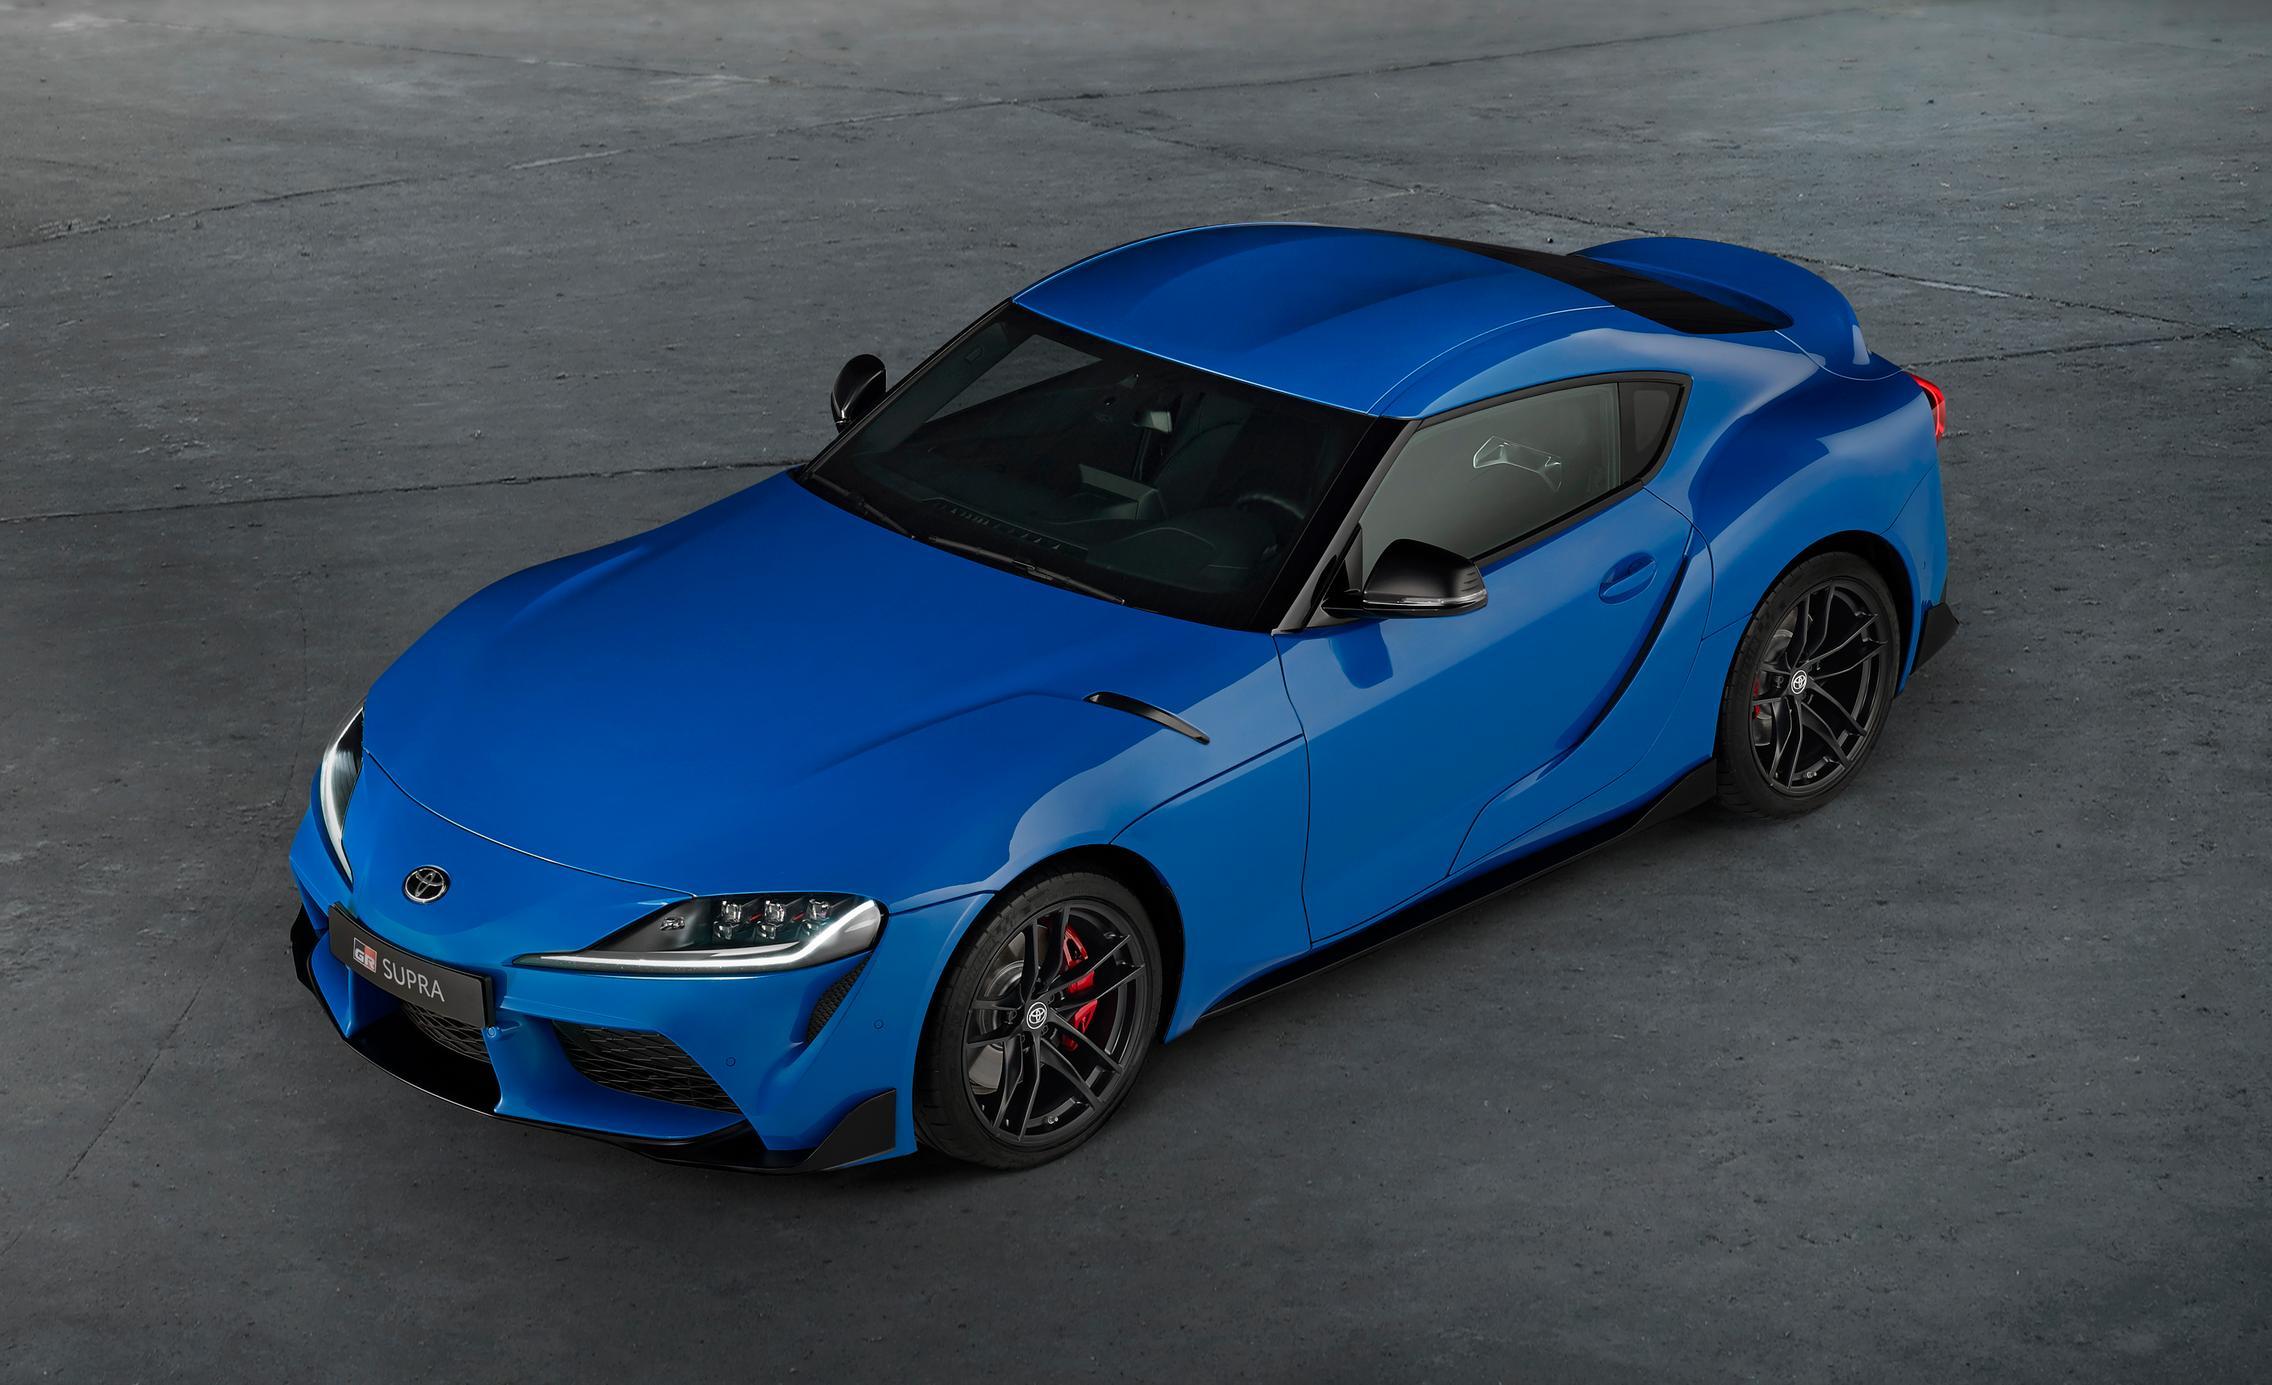 Toyota GR Supra Blue